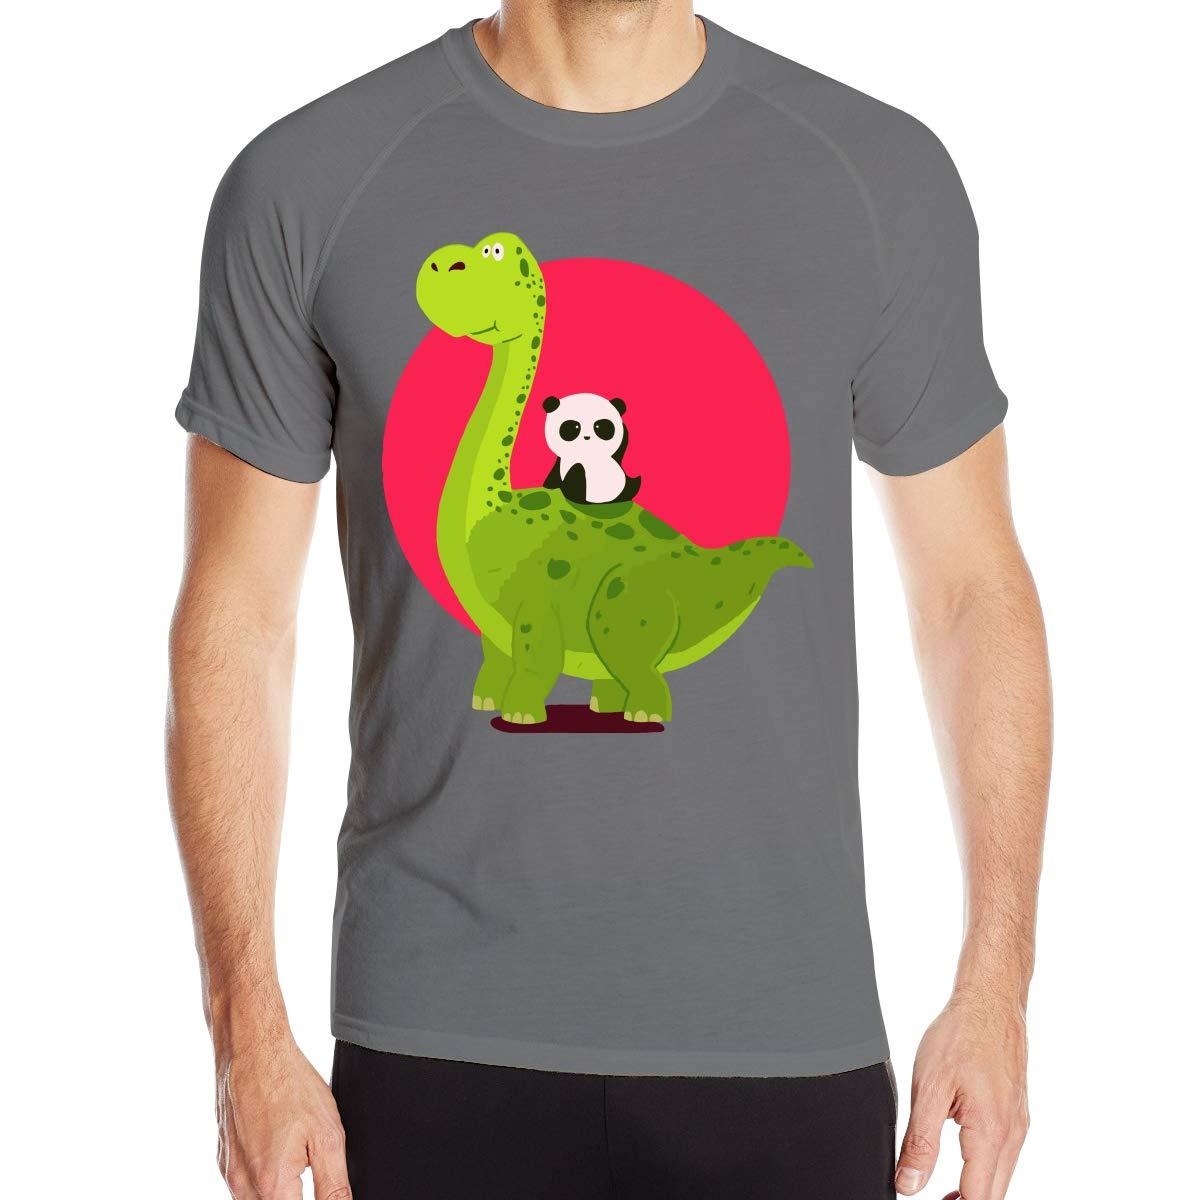 XueDaoStore Panda Riding A Dinosaur Men Wash and Wear Round Neck Tshirts Tee Short-Sleeved Base Shirt